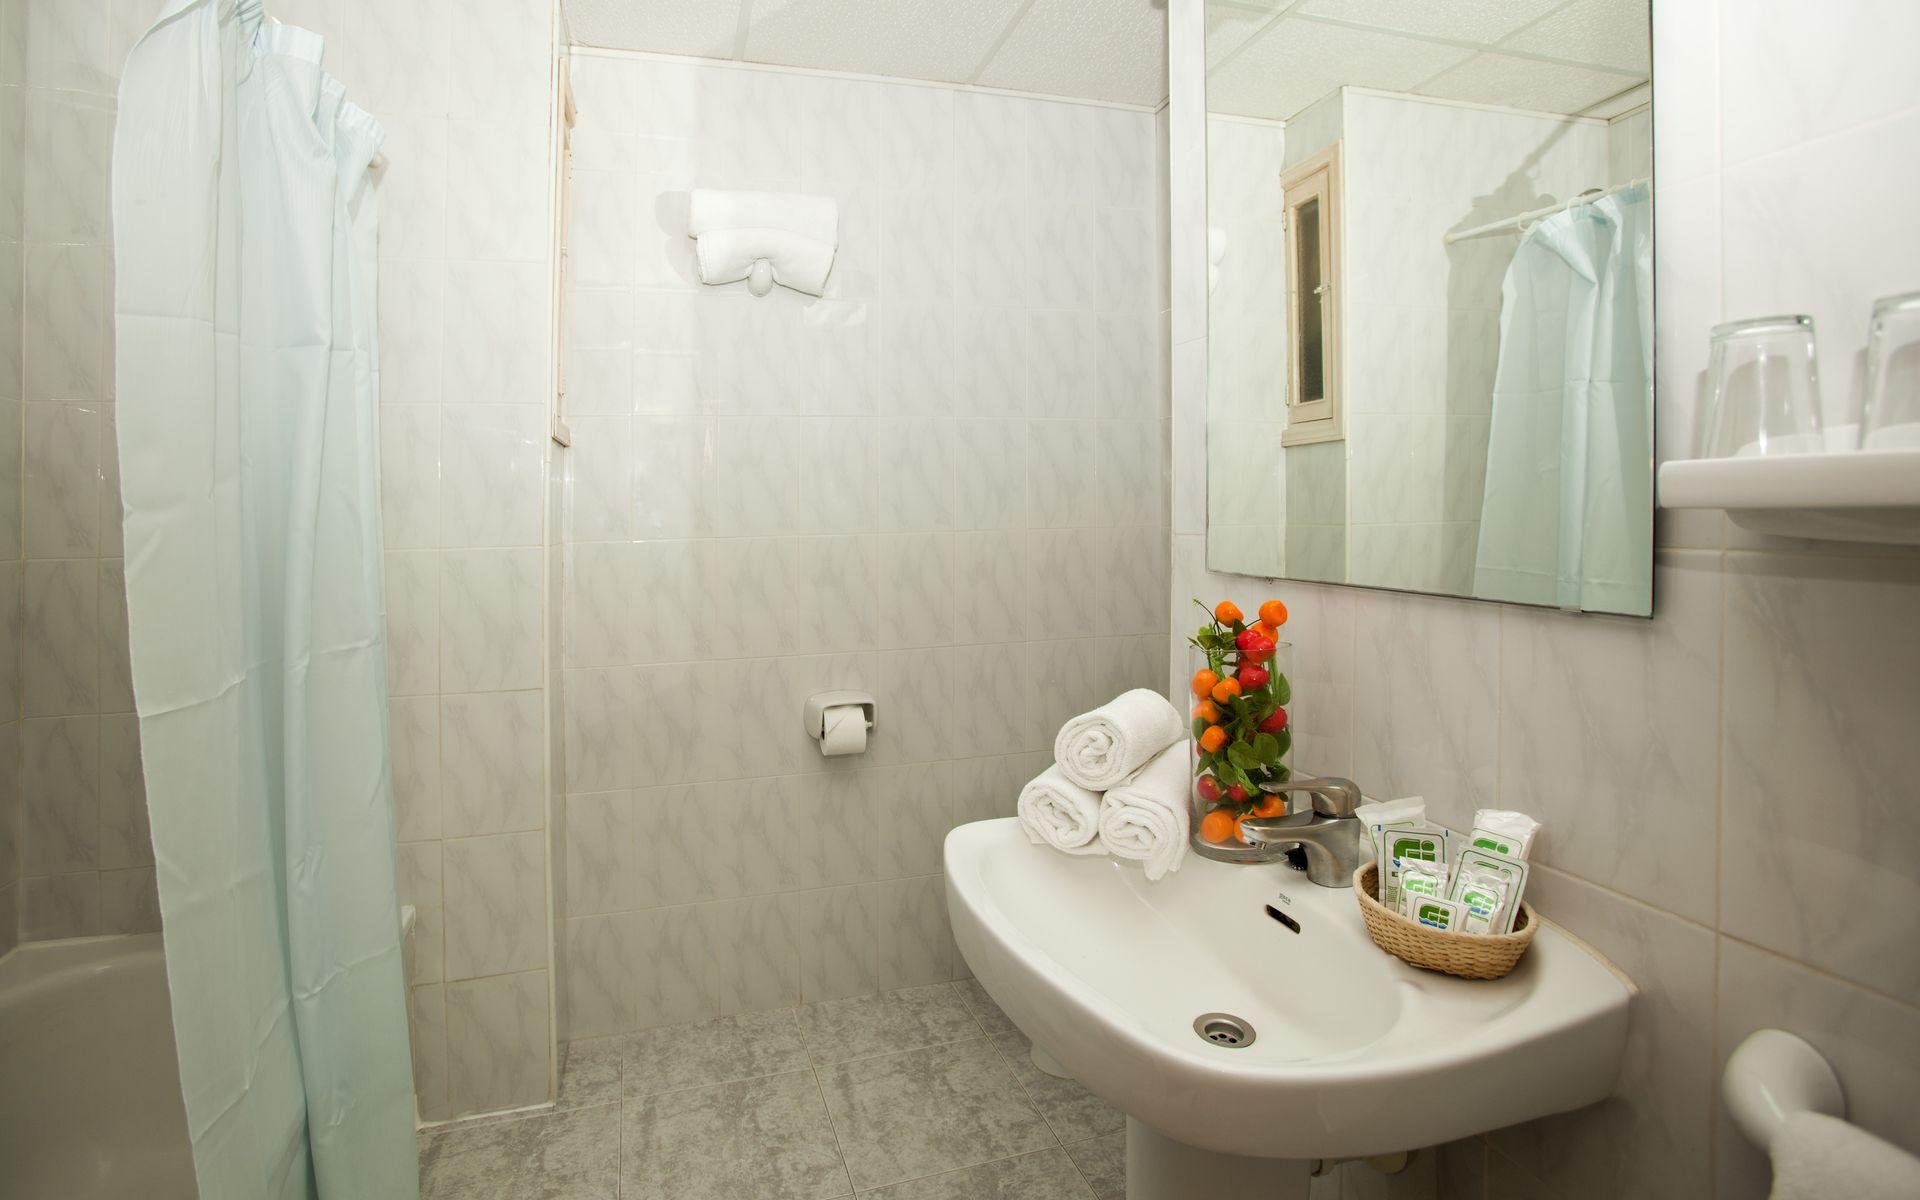 Baño Familiar Publico:Hotel Tropico Playa en Palmanova – Mallorca desde 44 €